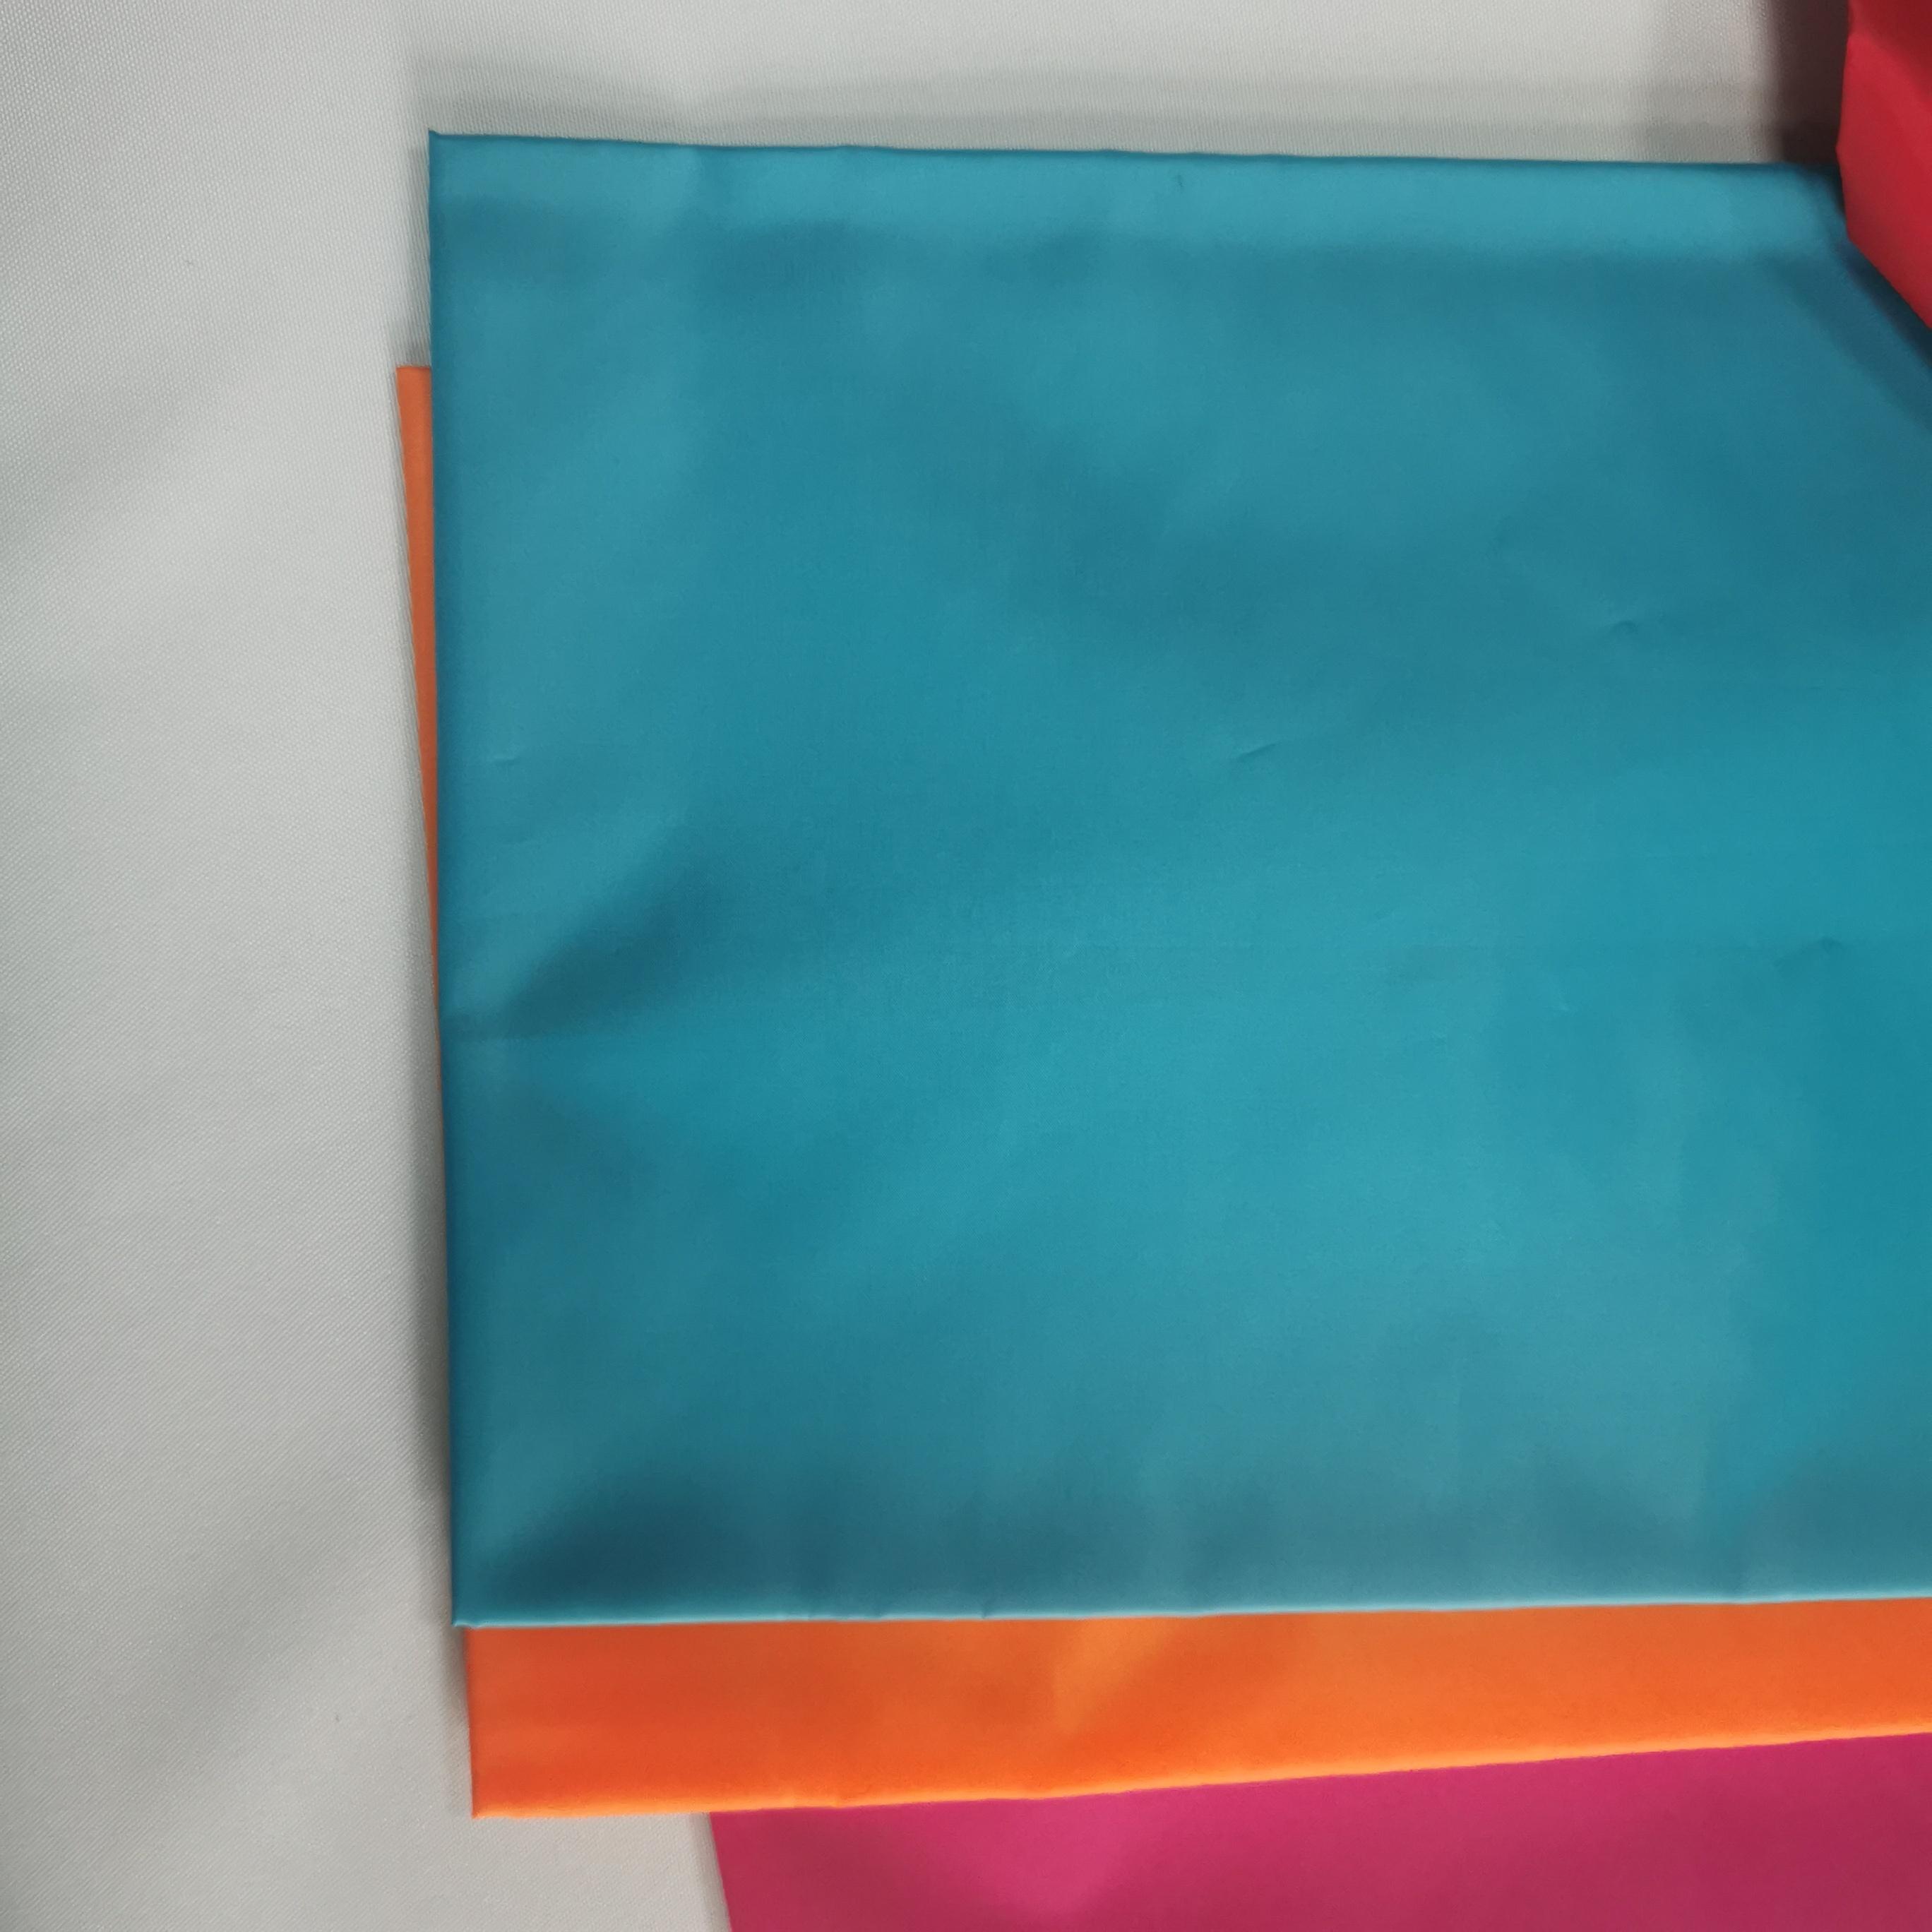 Hot sale  210T Polyester Taffeta Fabric Lining 80g 210T 90g 100g Garment Lining